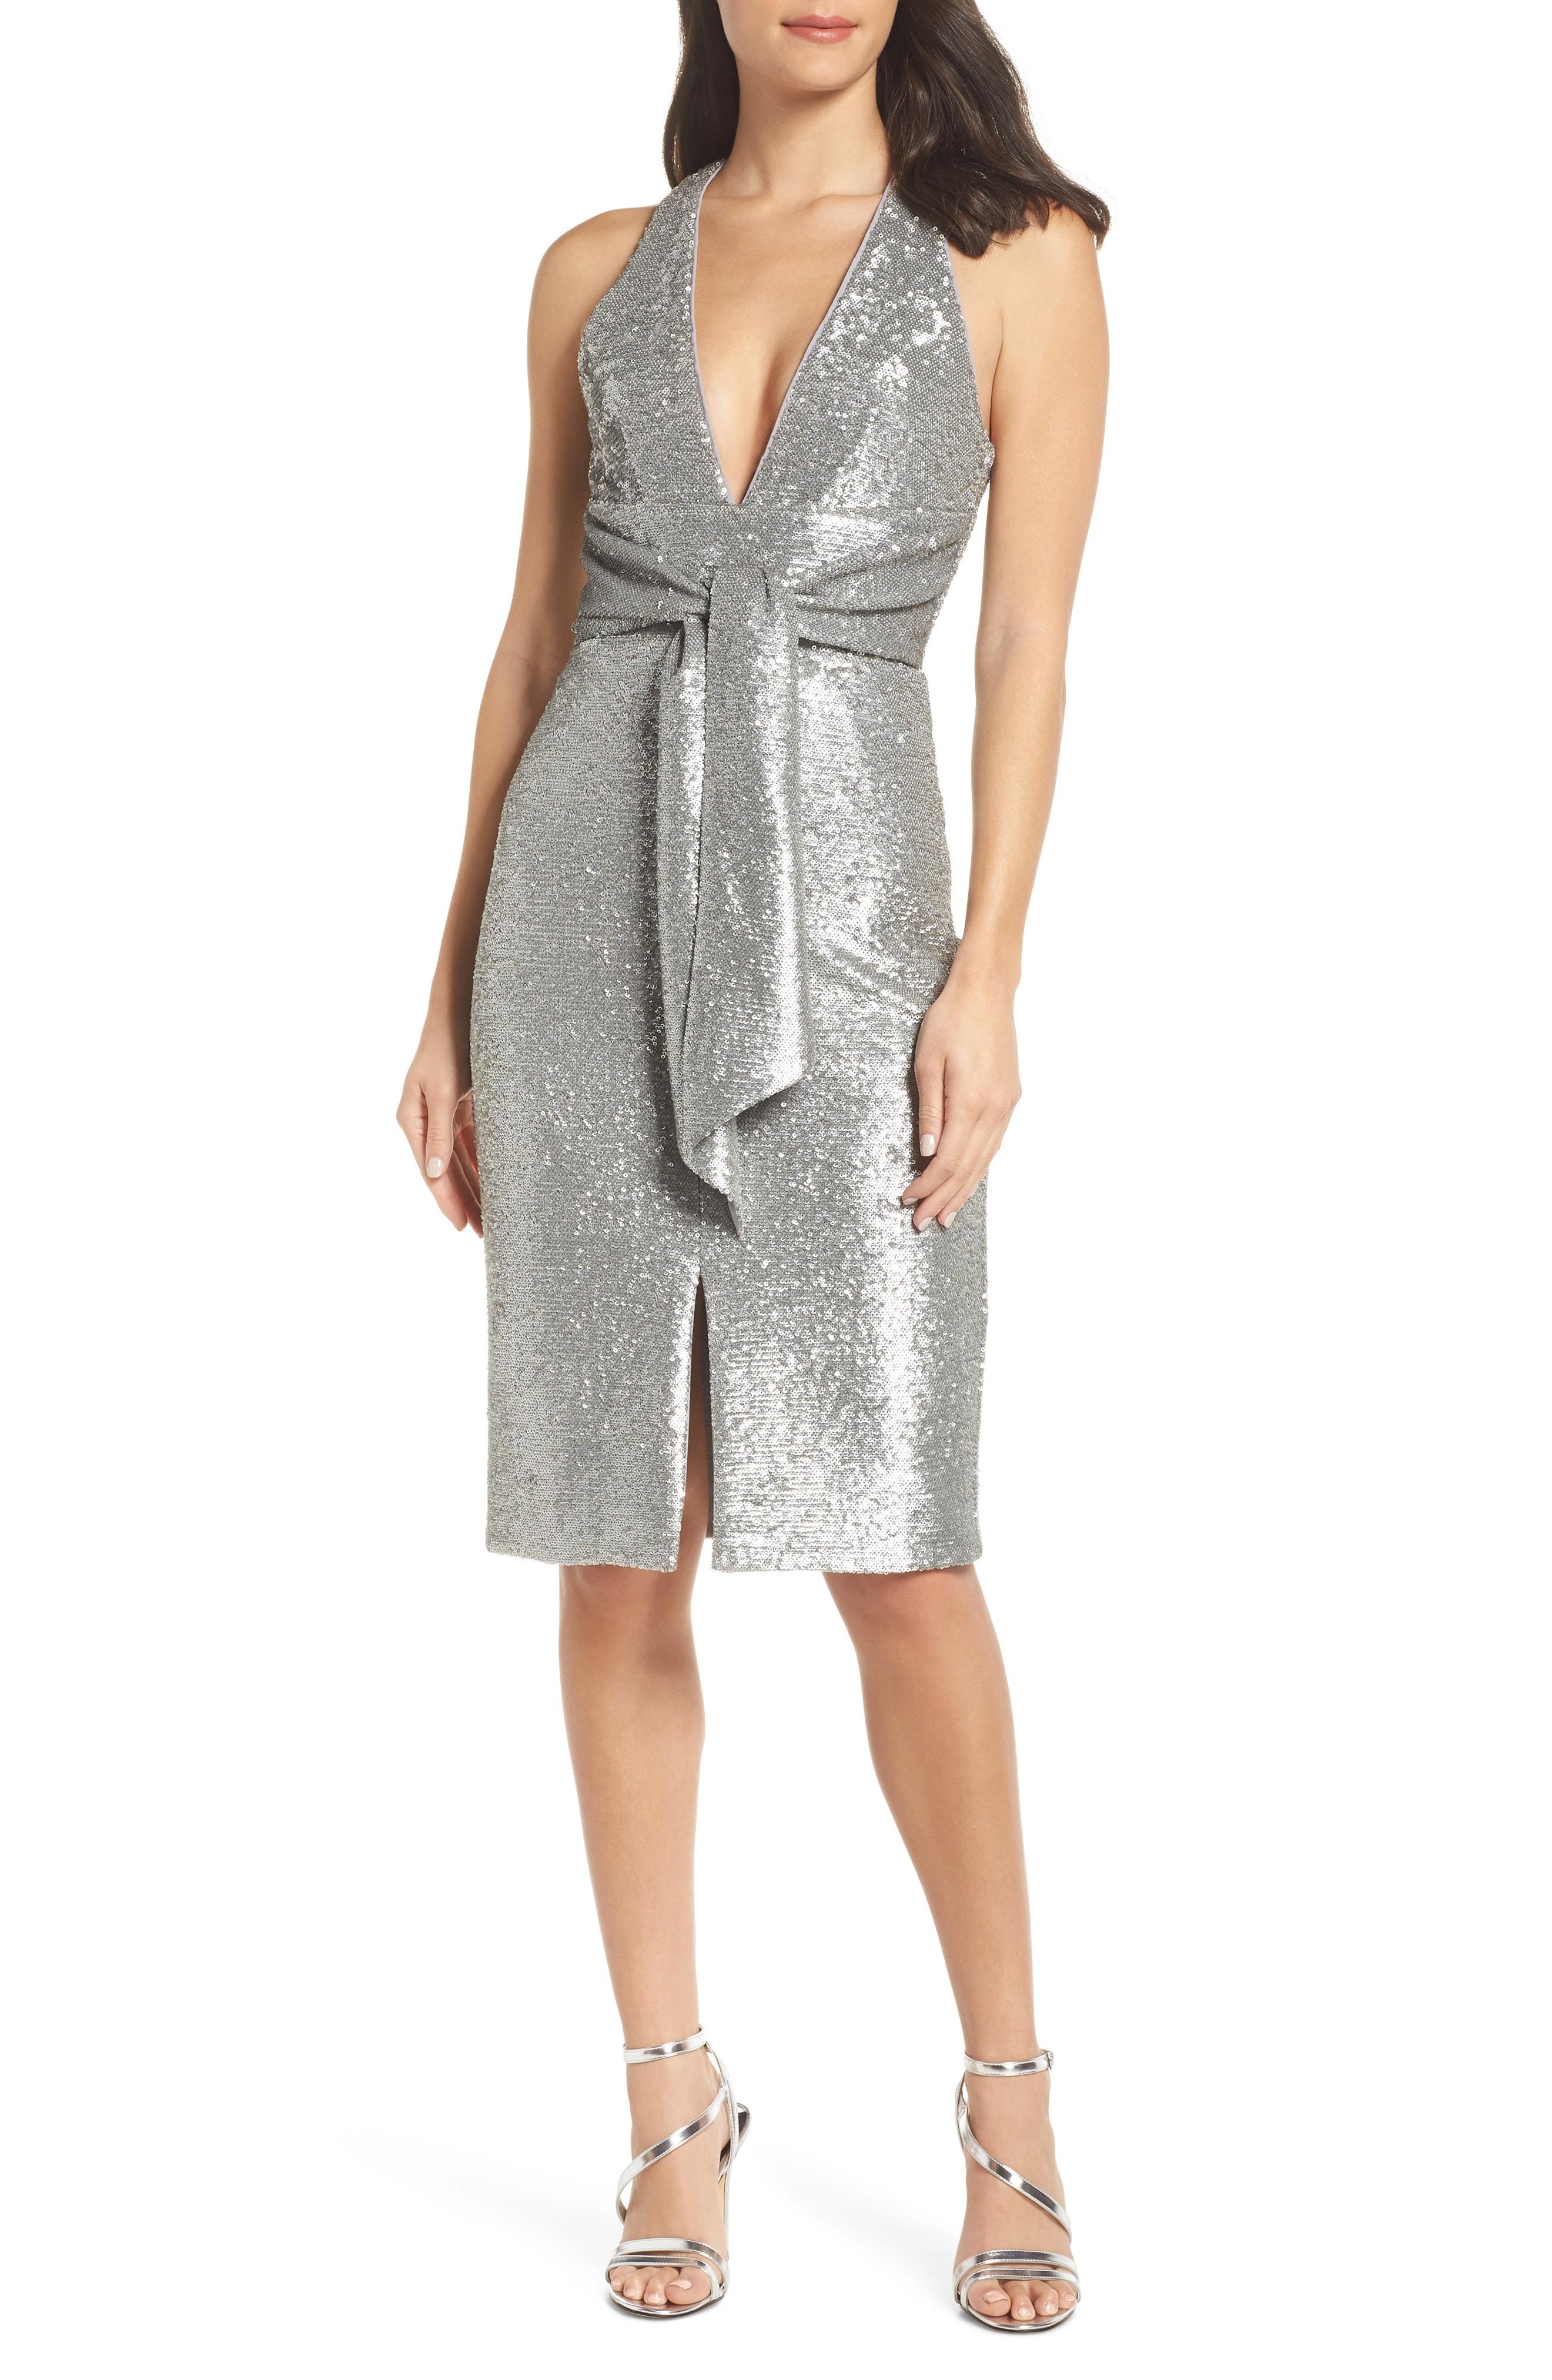 Harlyn Plunge Neck Sequin Dress